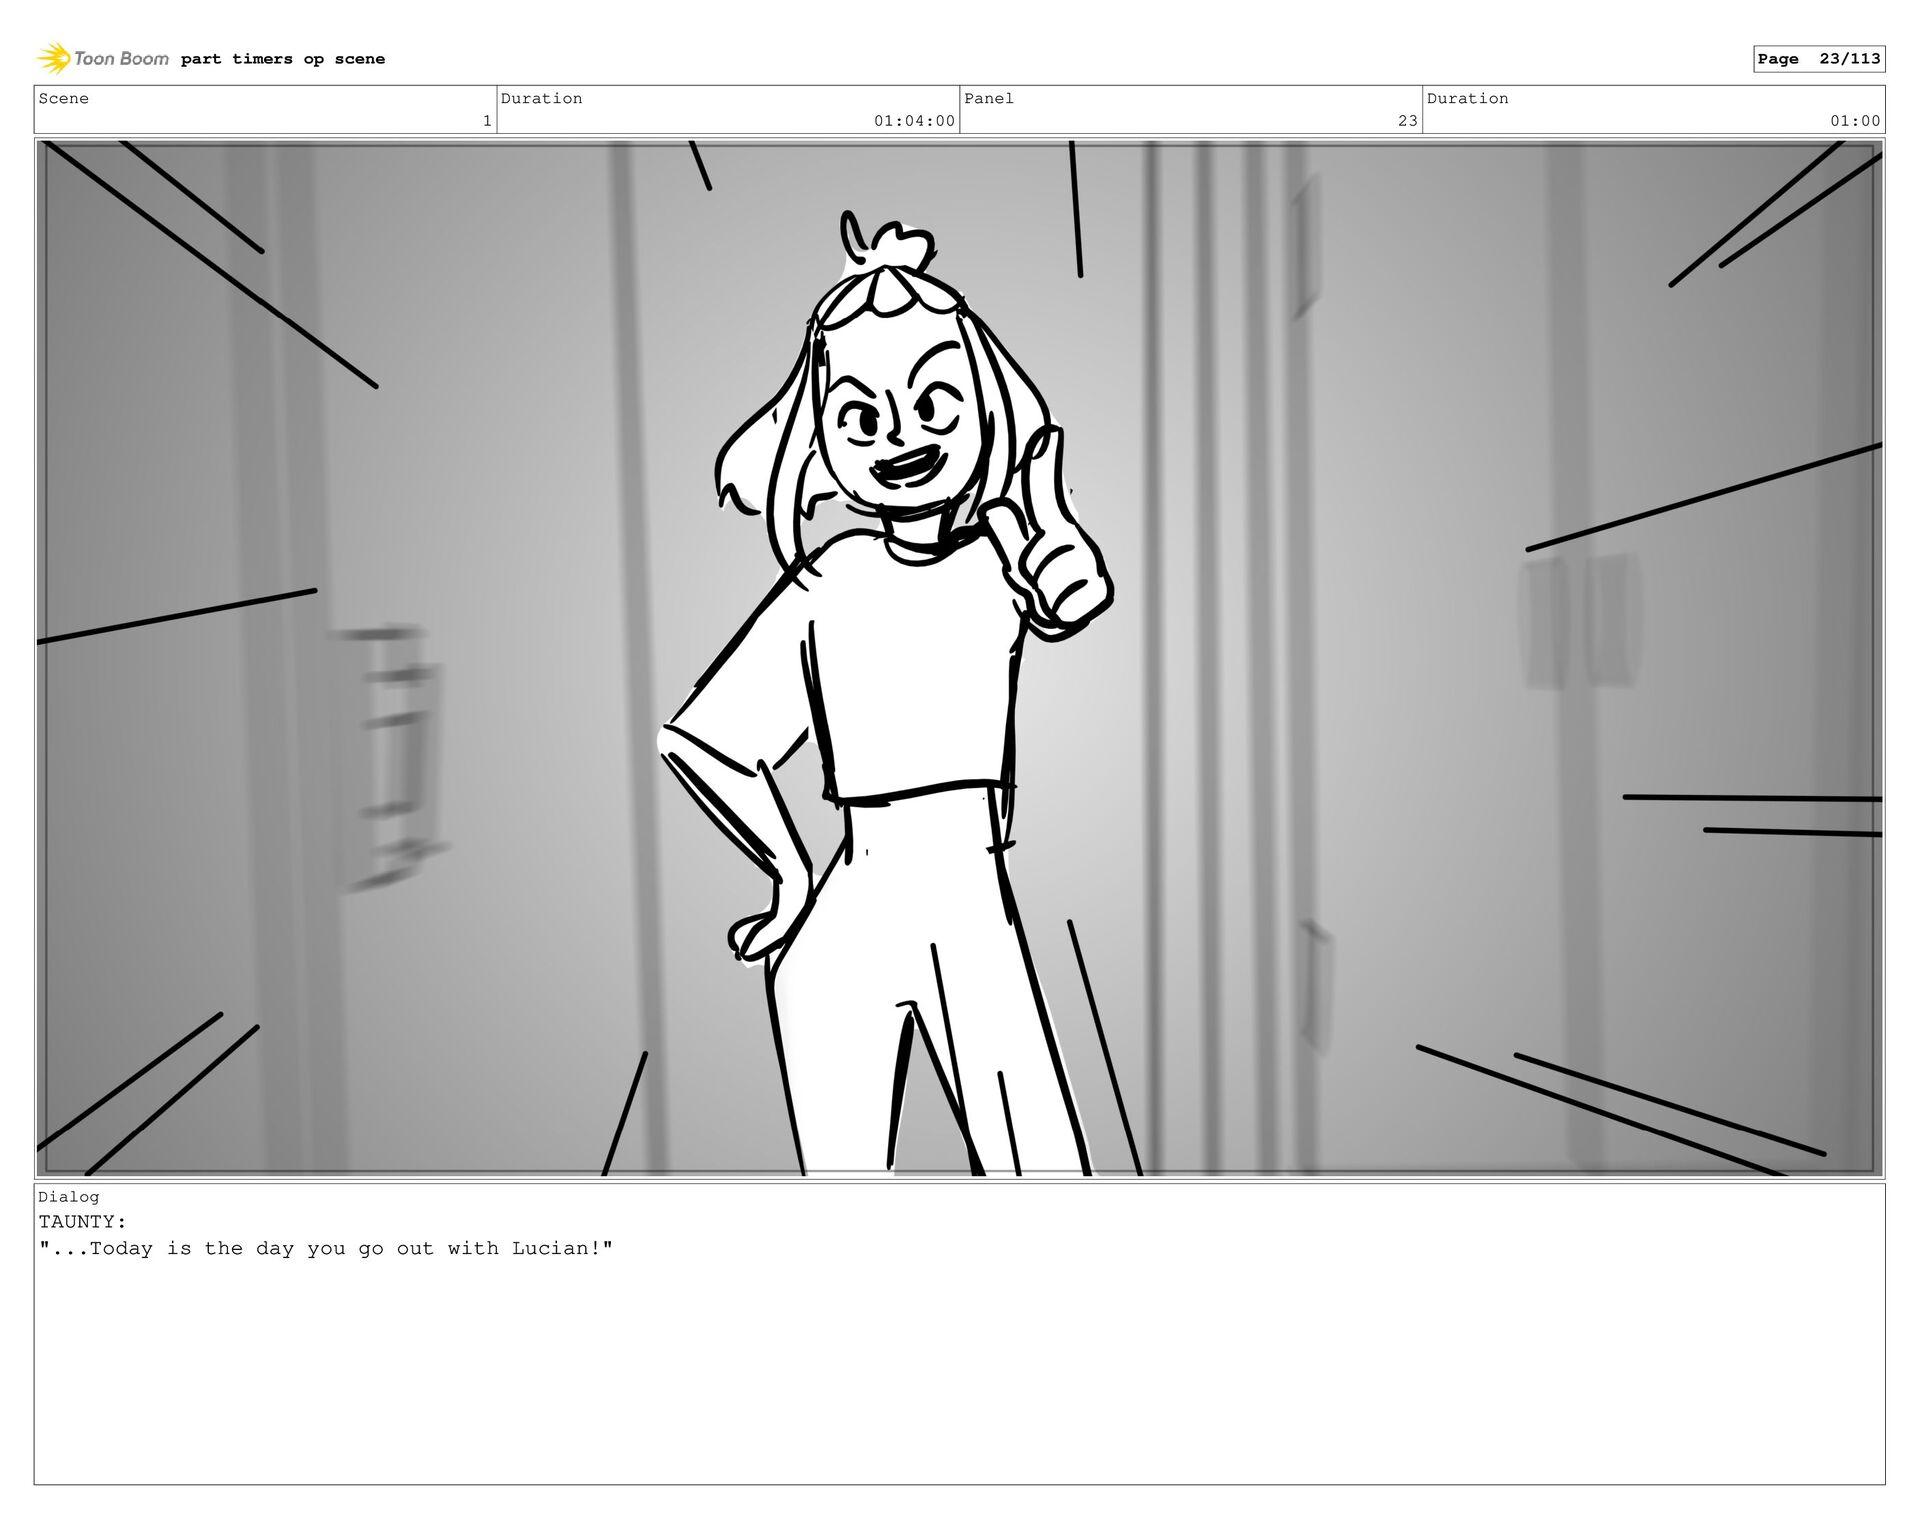 Scene 1 Duration 26:00 Panel 22 Duration 01:00 ...